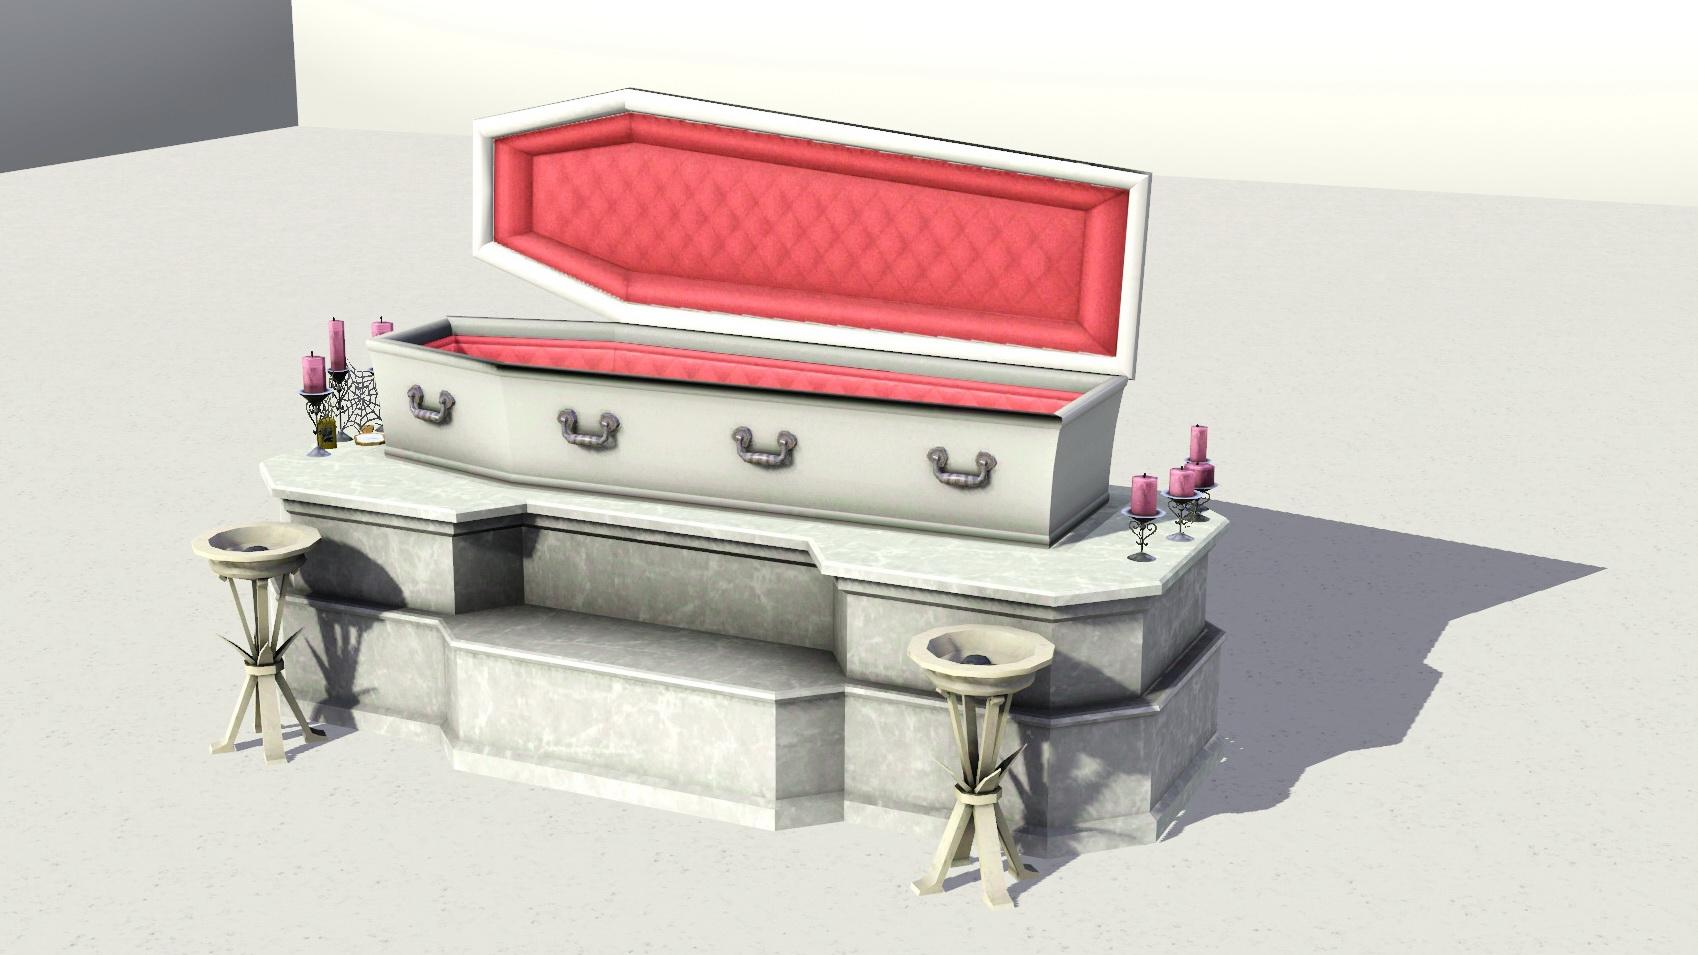 Mod The Sims - Vampire Coffin (TS2: Nightlife Adaptation)